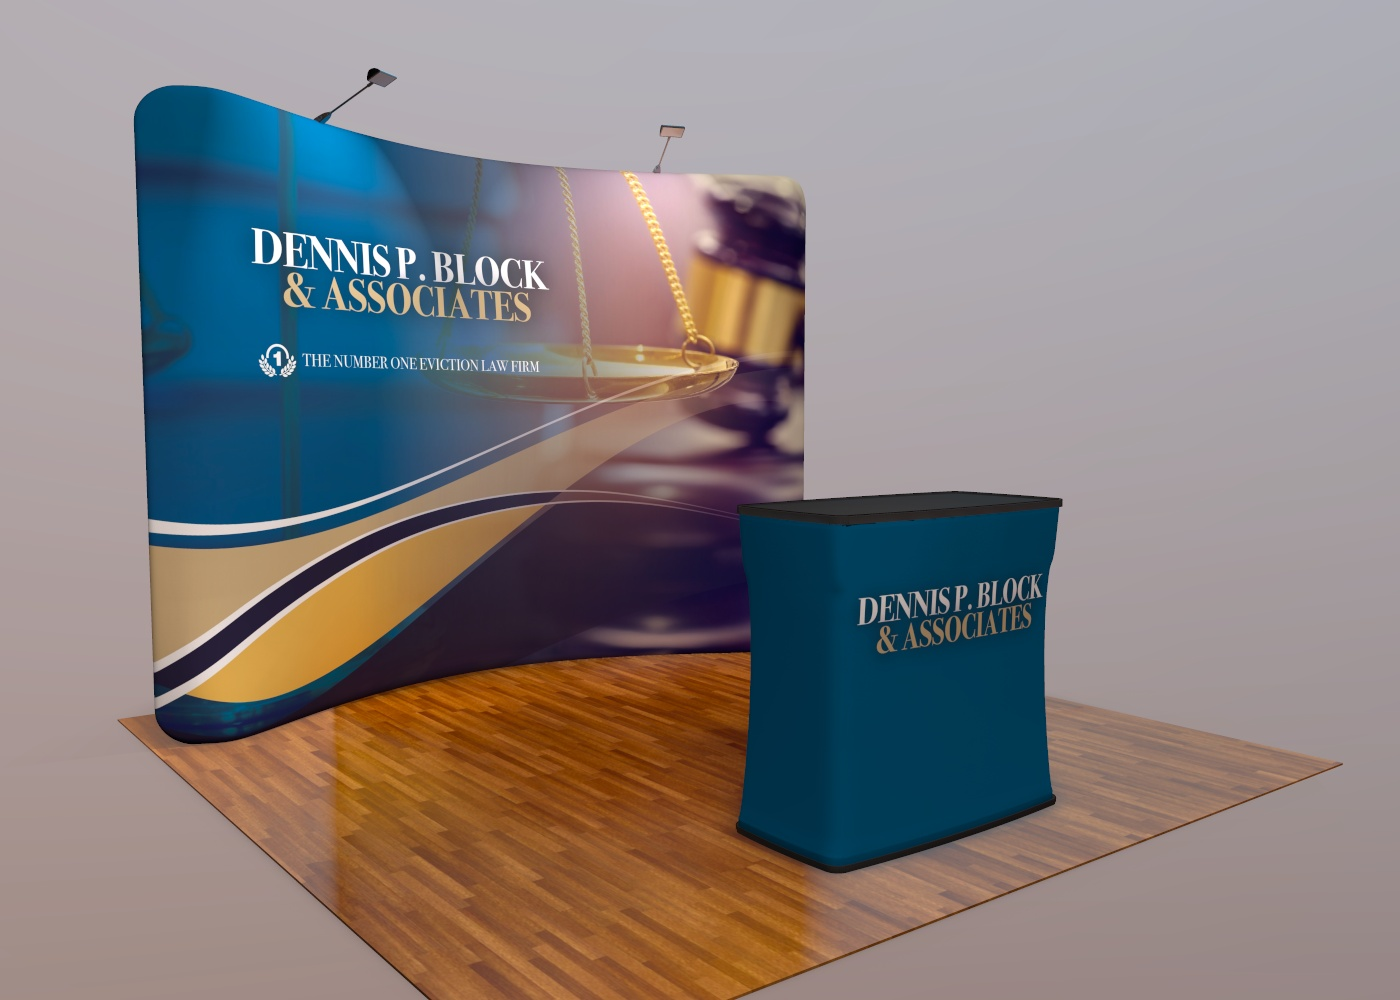 Dennis Block